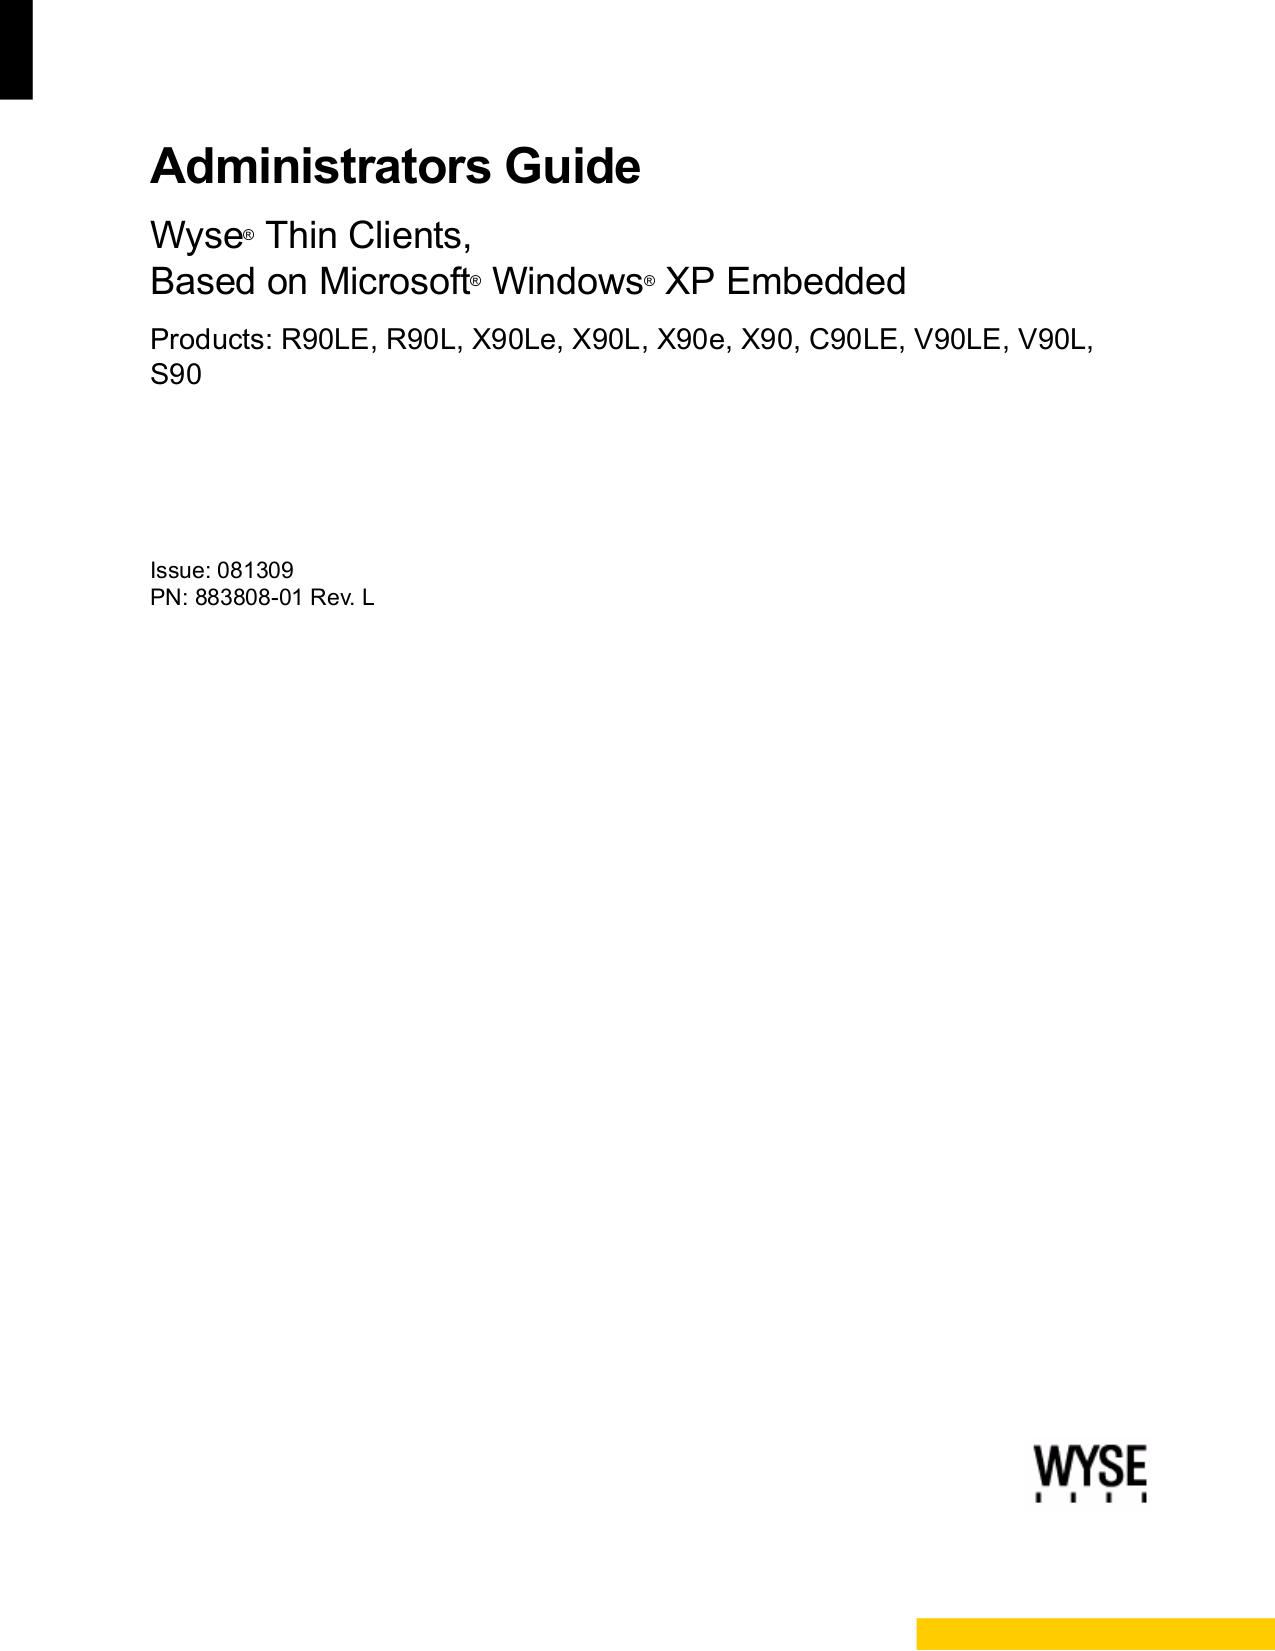 pdf for Wyse Desktop Winterm S10 manual